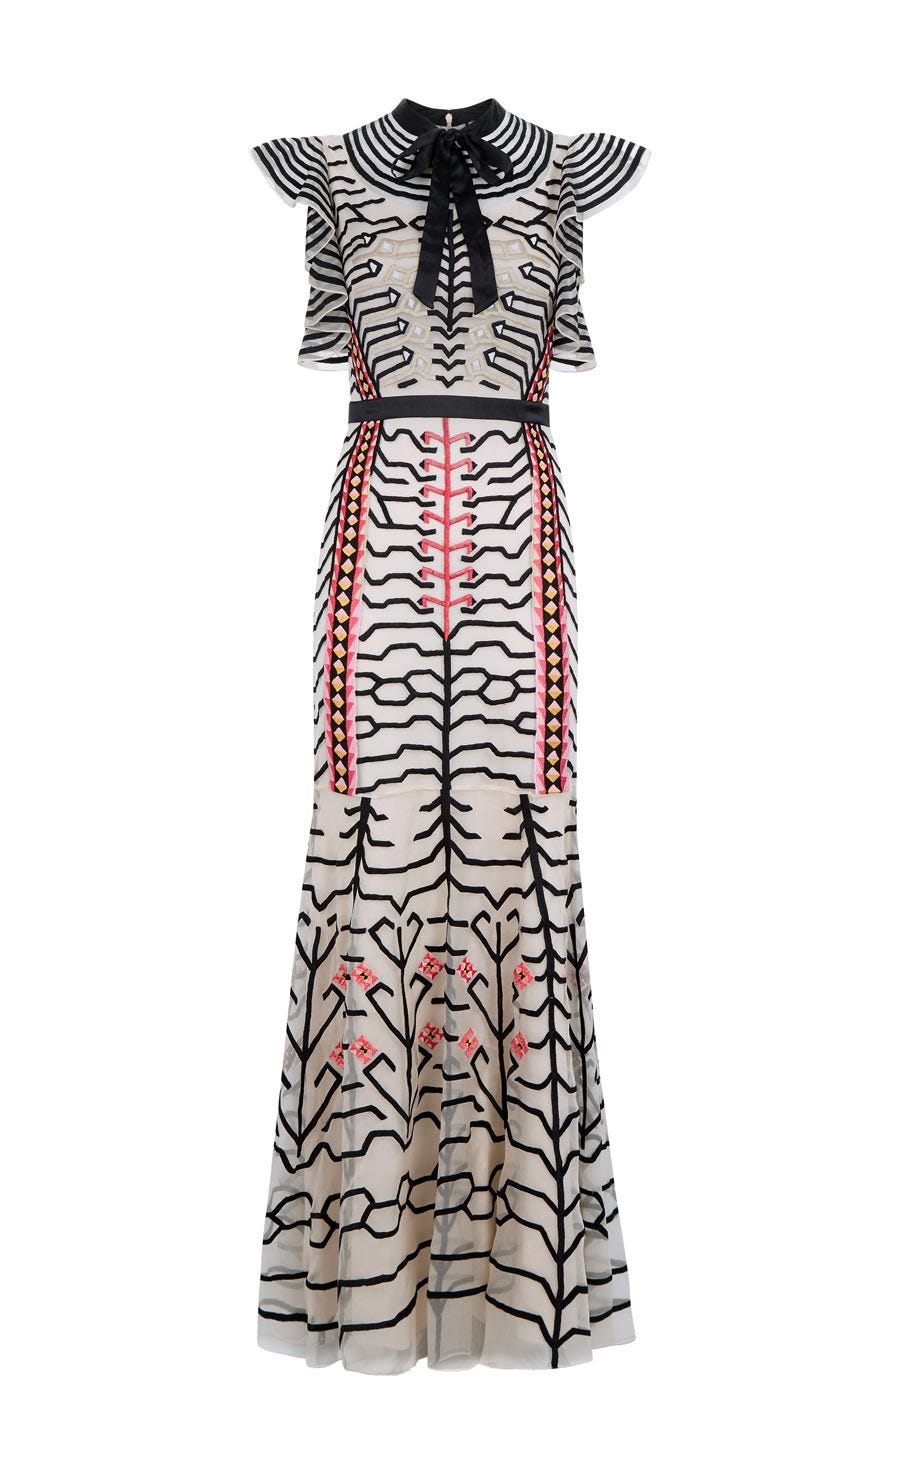 Canopy Evening Dress